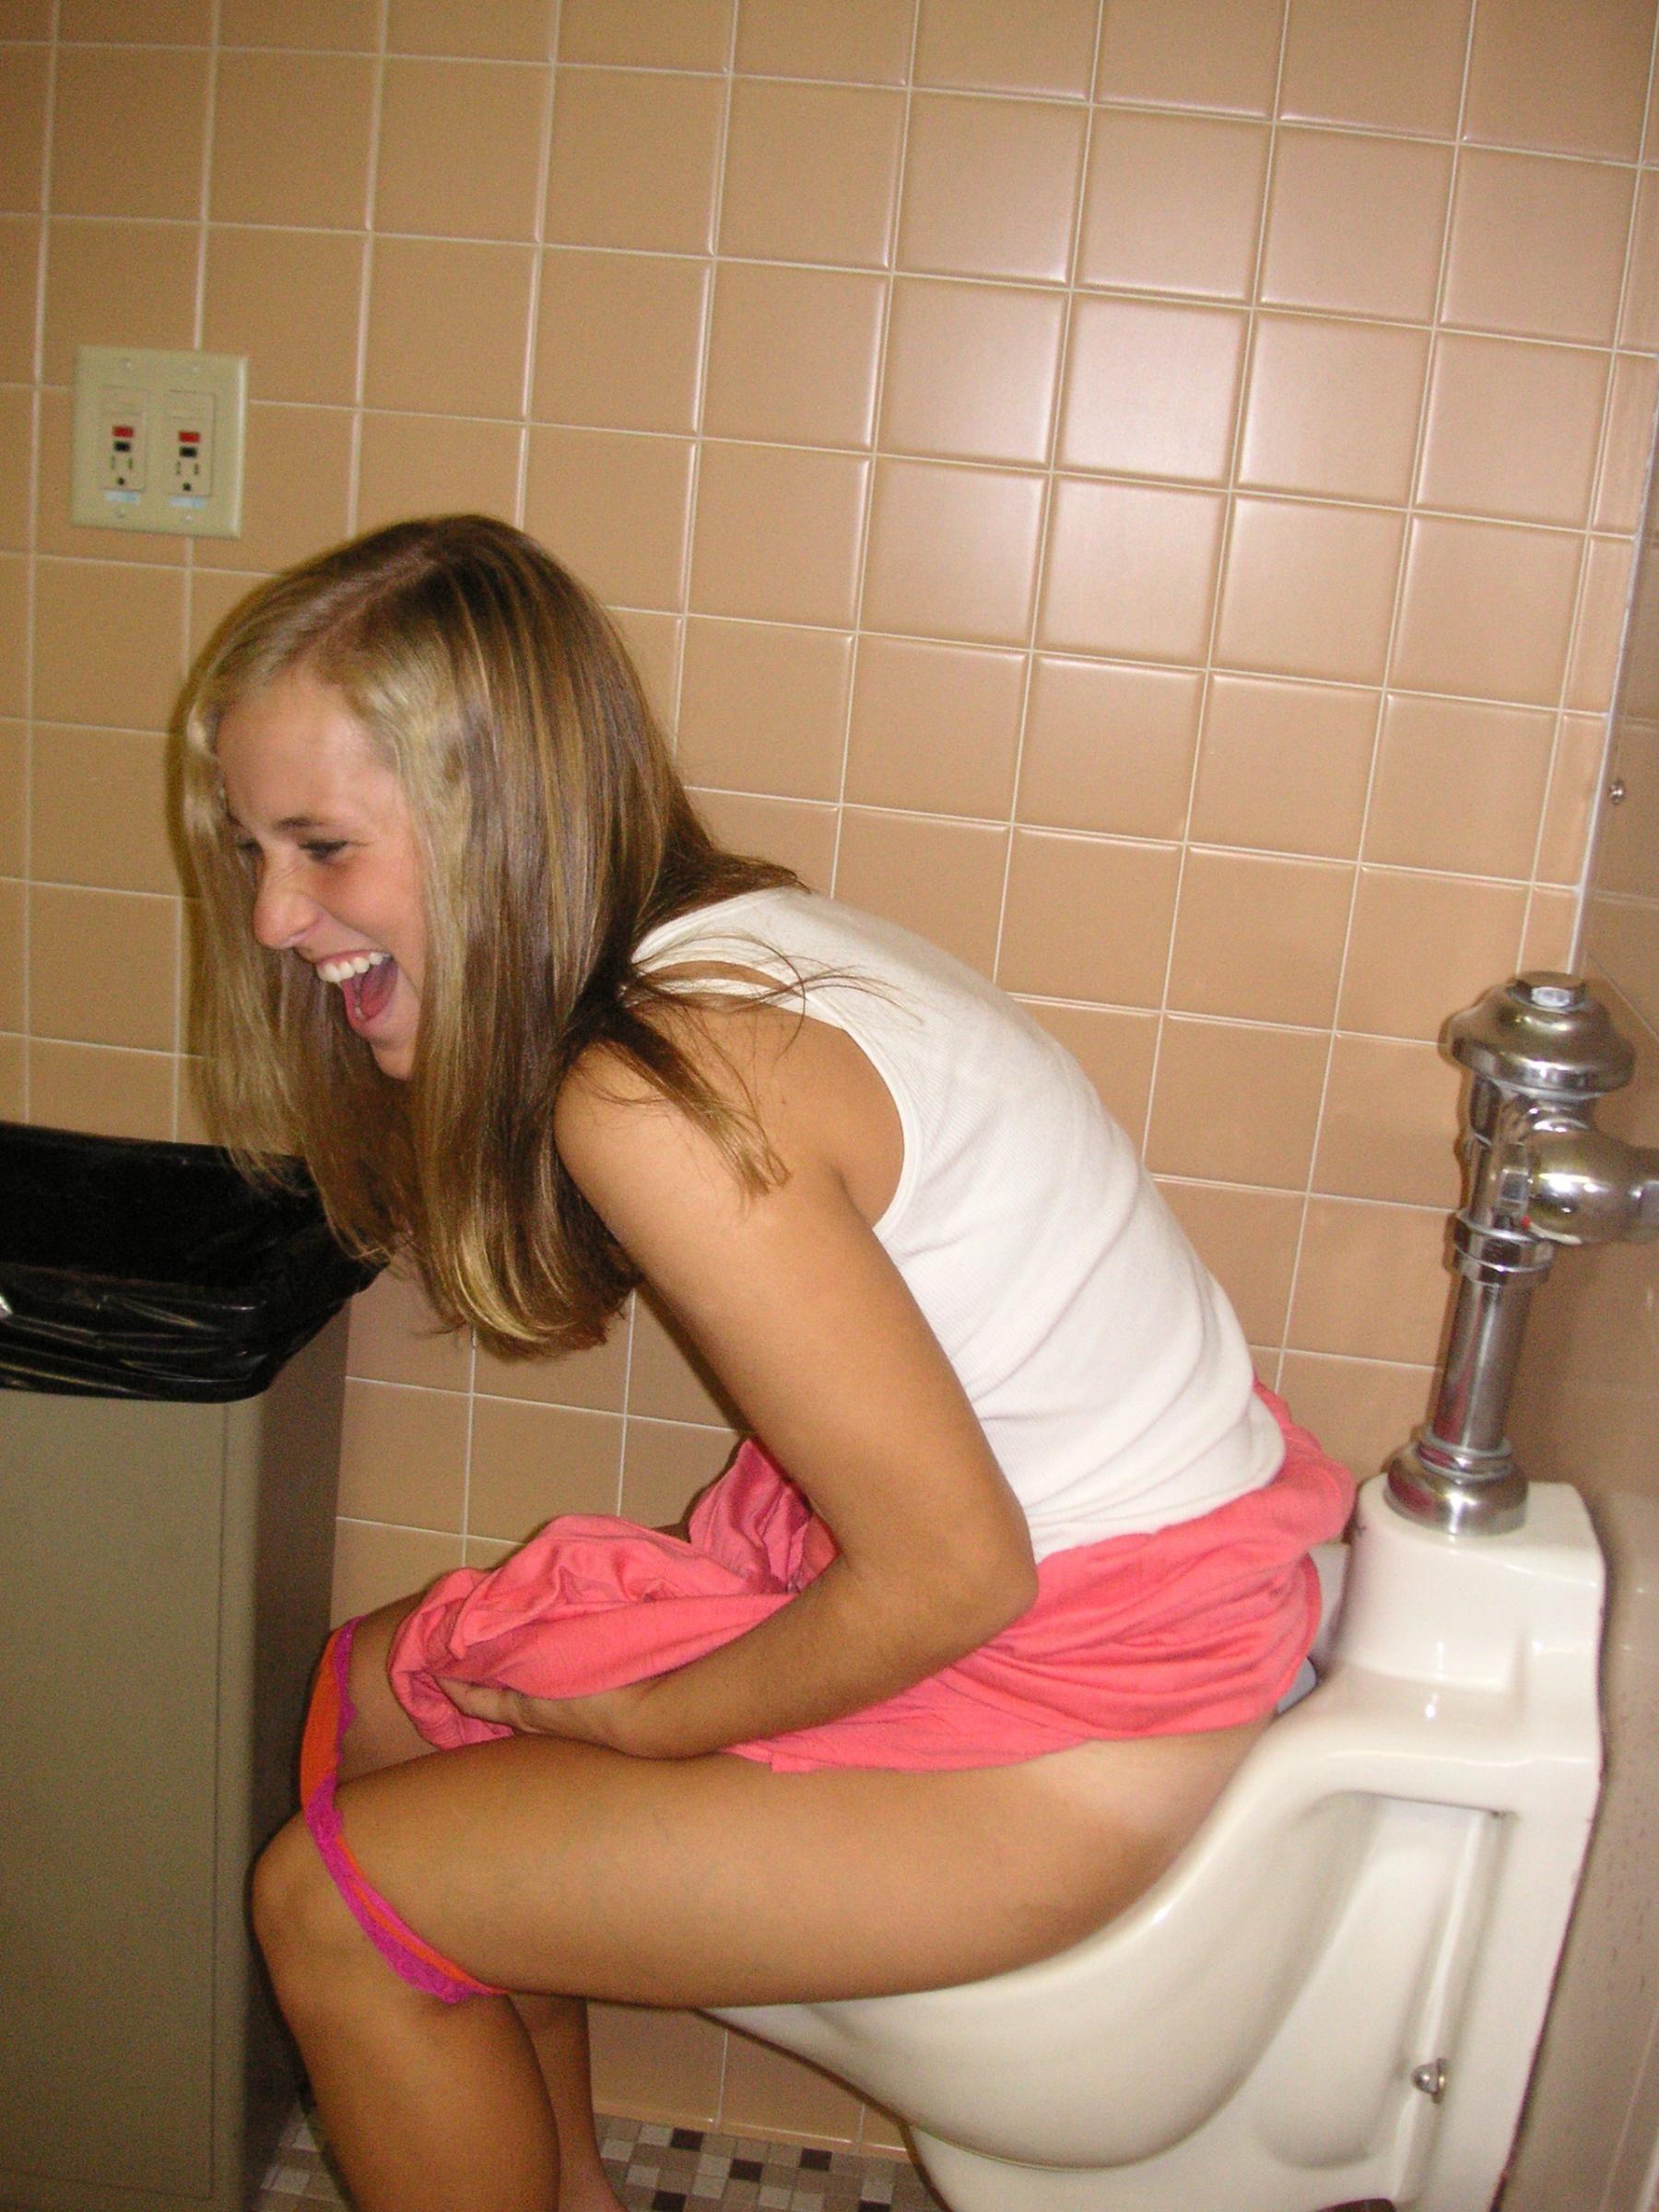 best of Toilet Girls peeing over